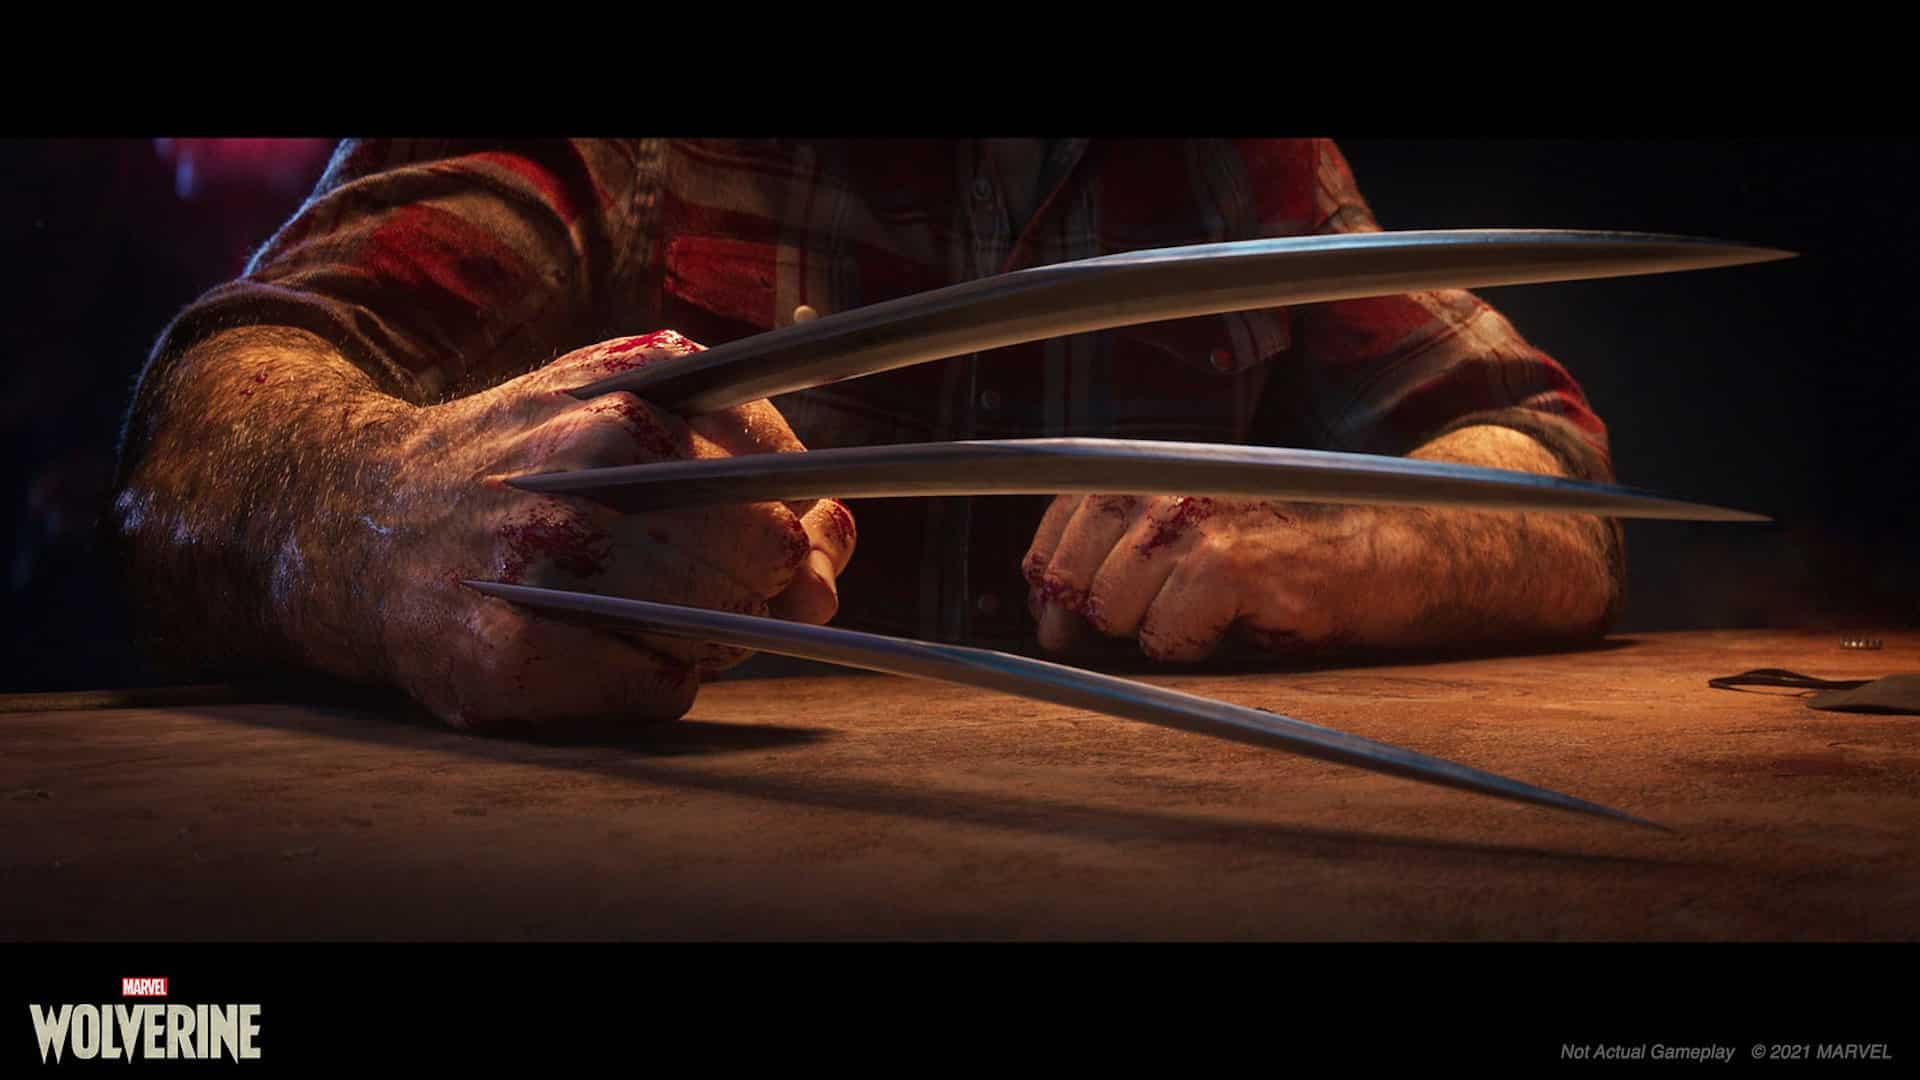 Marvel's Wolverine - not main